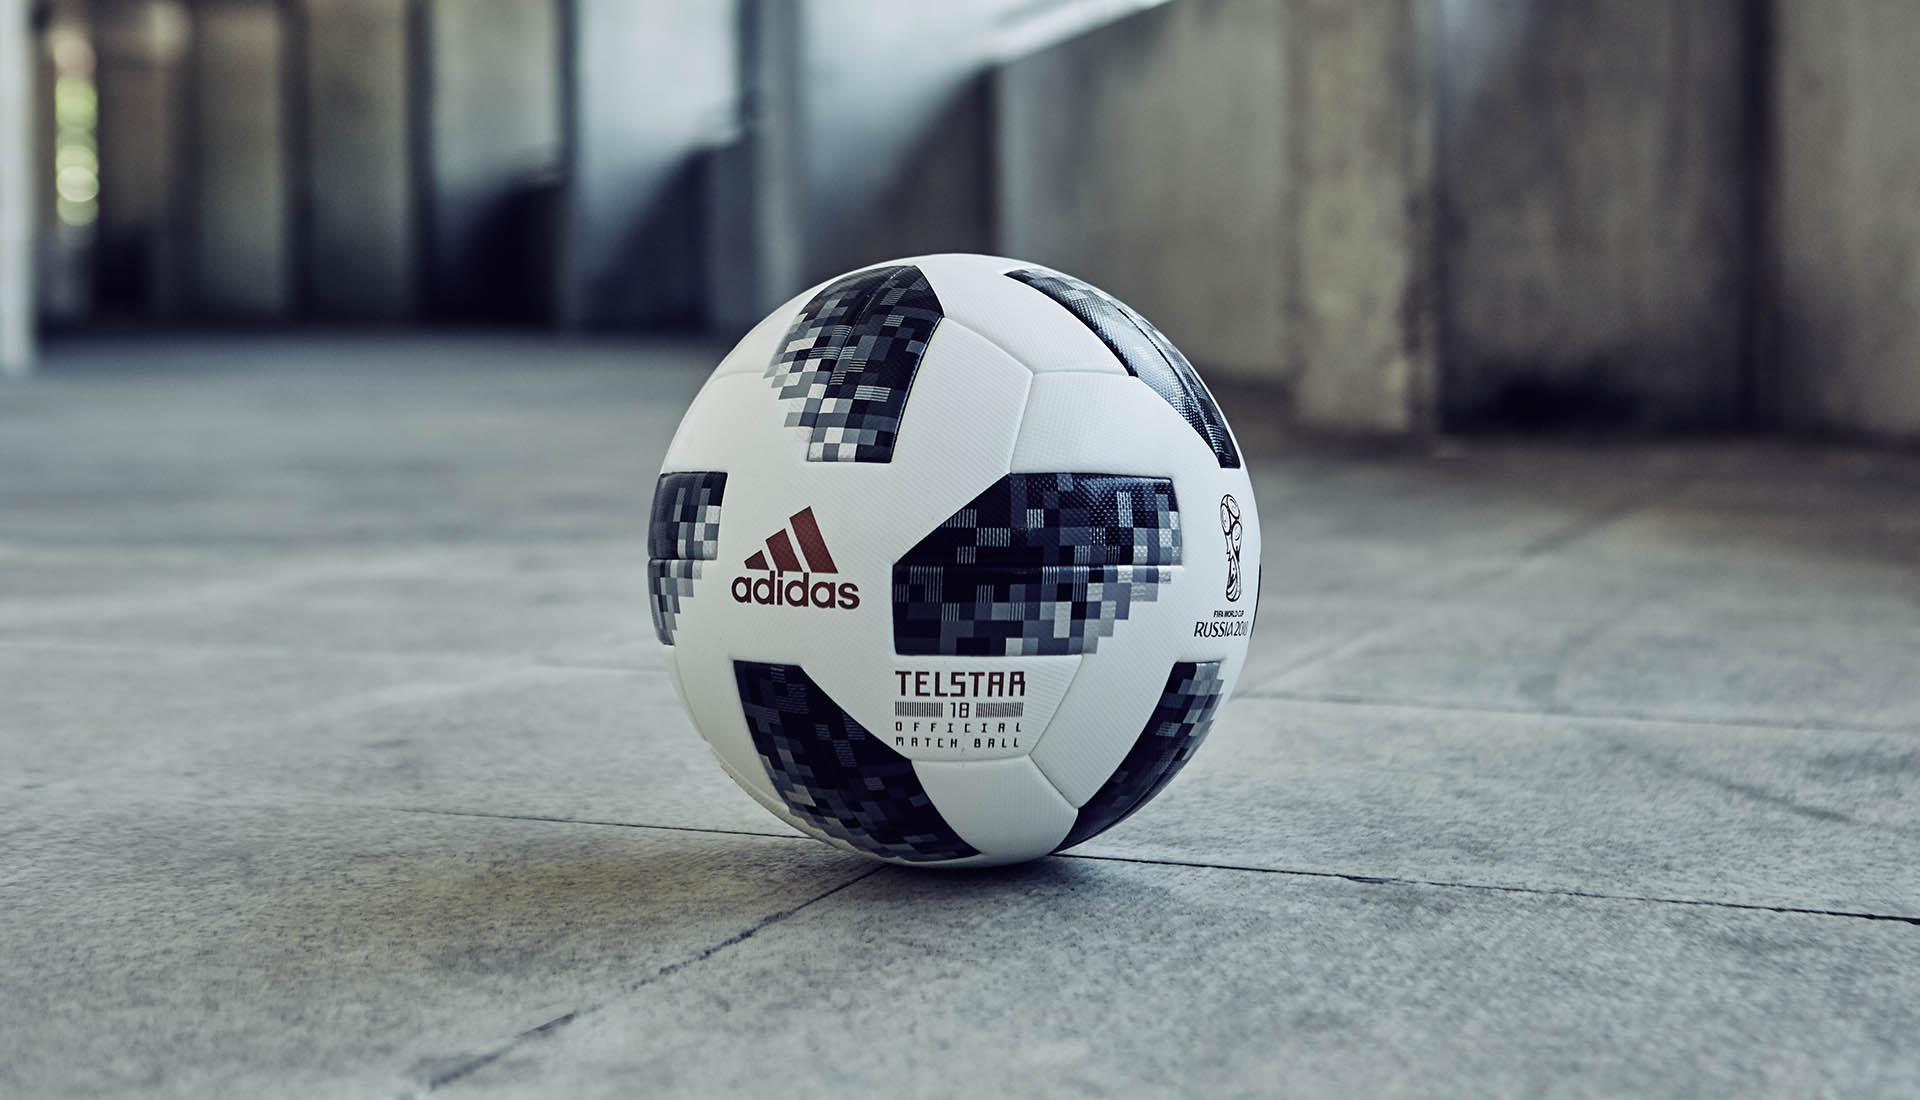 world-cup-match-ball-adidas-soccerbible_0001__fg_1988